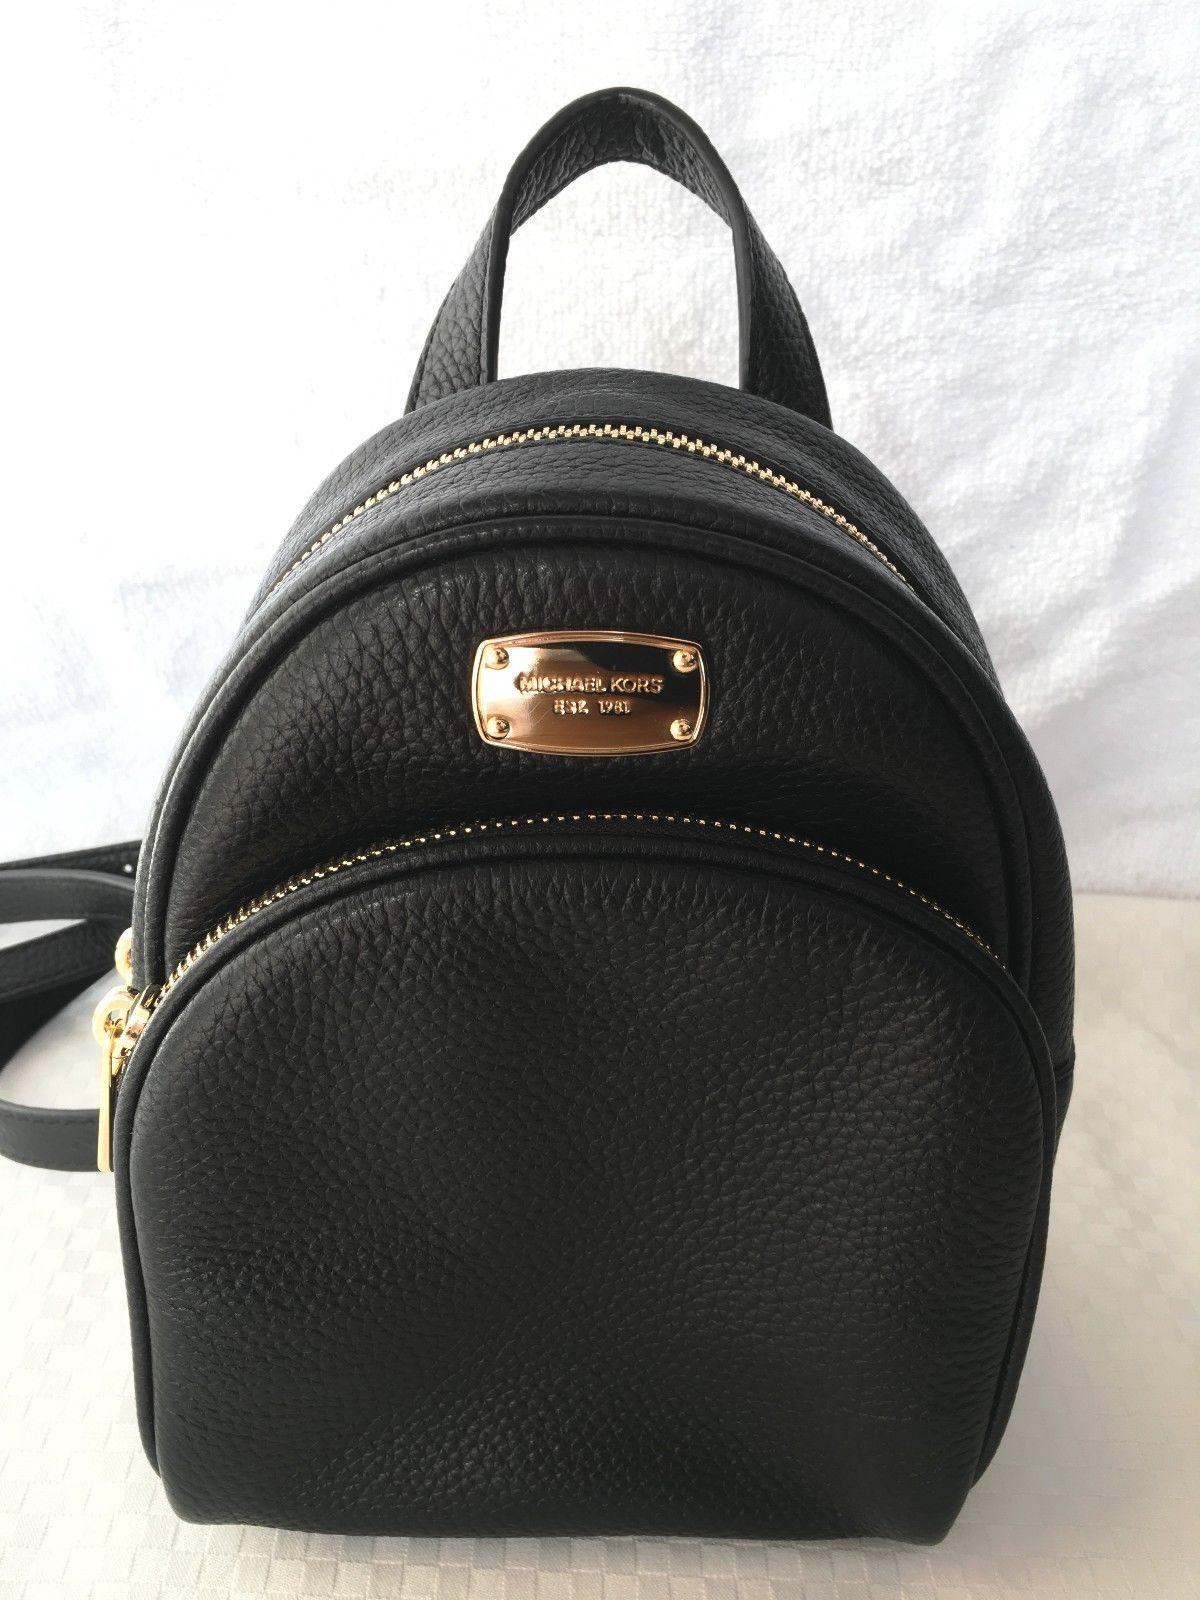 785ba87b6f4b9f ... netherlands nwt michael kors abbey xs mini backpack black pebble  leather mk bag authentic 1811c 45aba